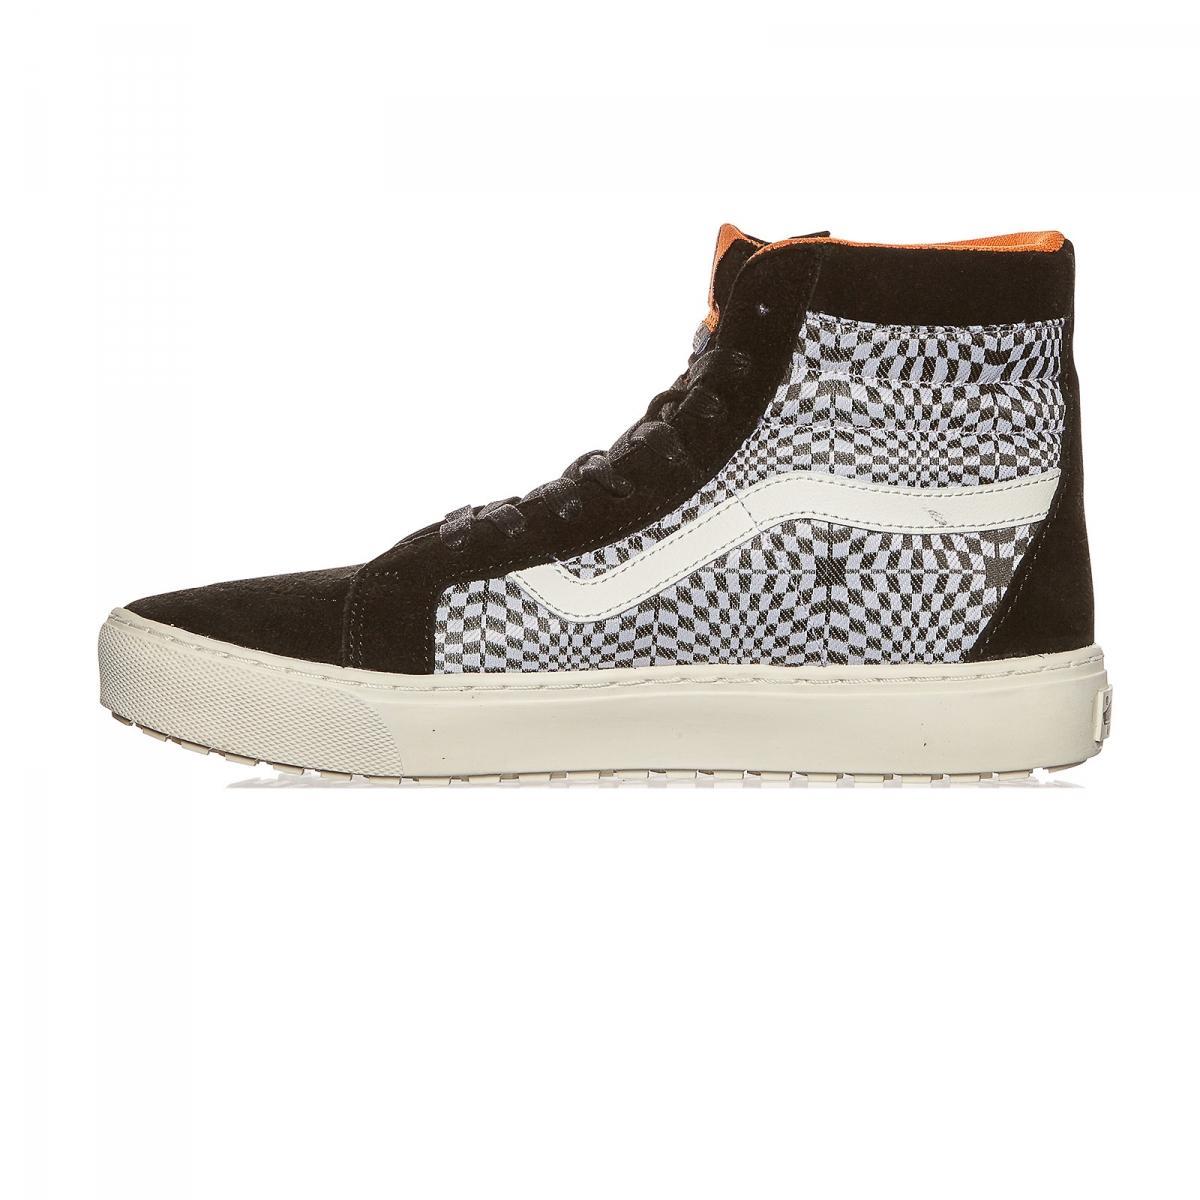 2813fbe720 Lyst - Vans London Undercover Vault Sk8 Hi Mte Cup Lx Sneakers for Men